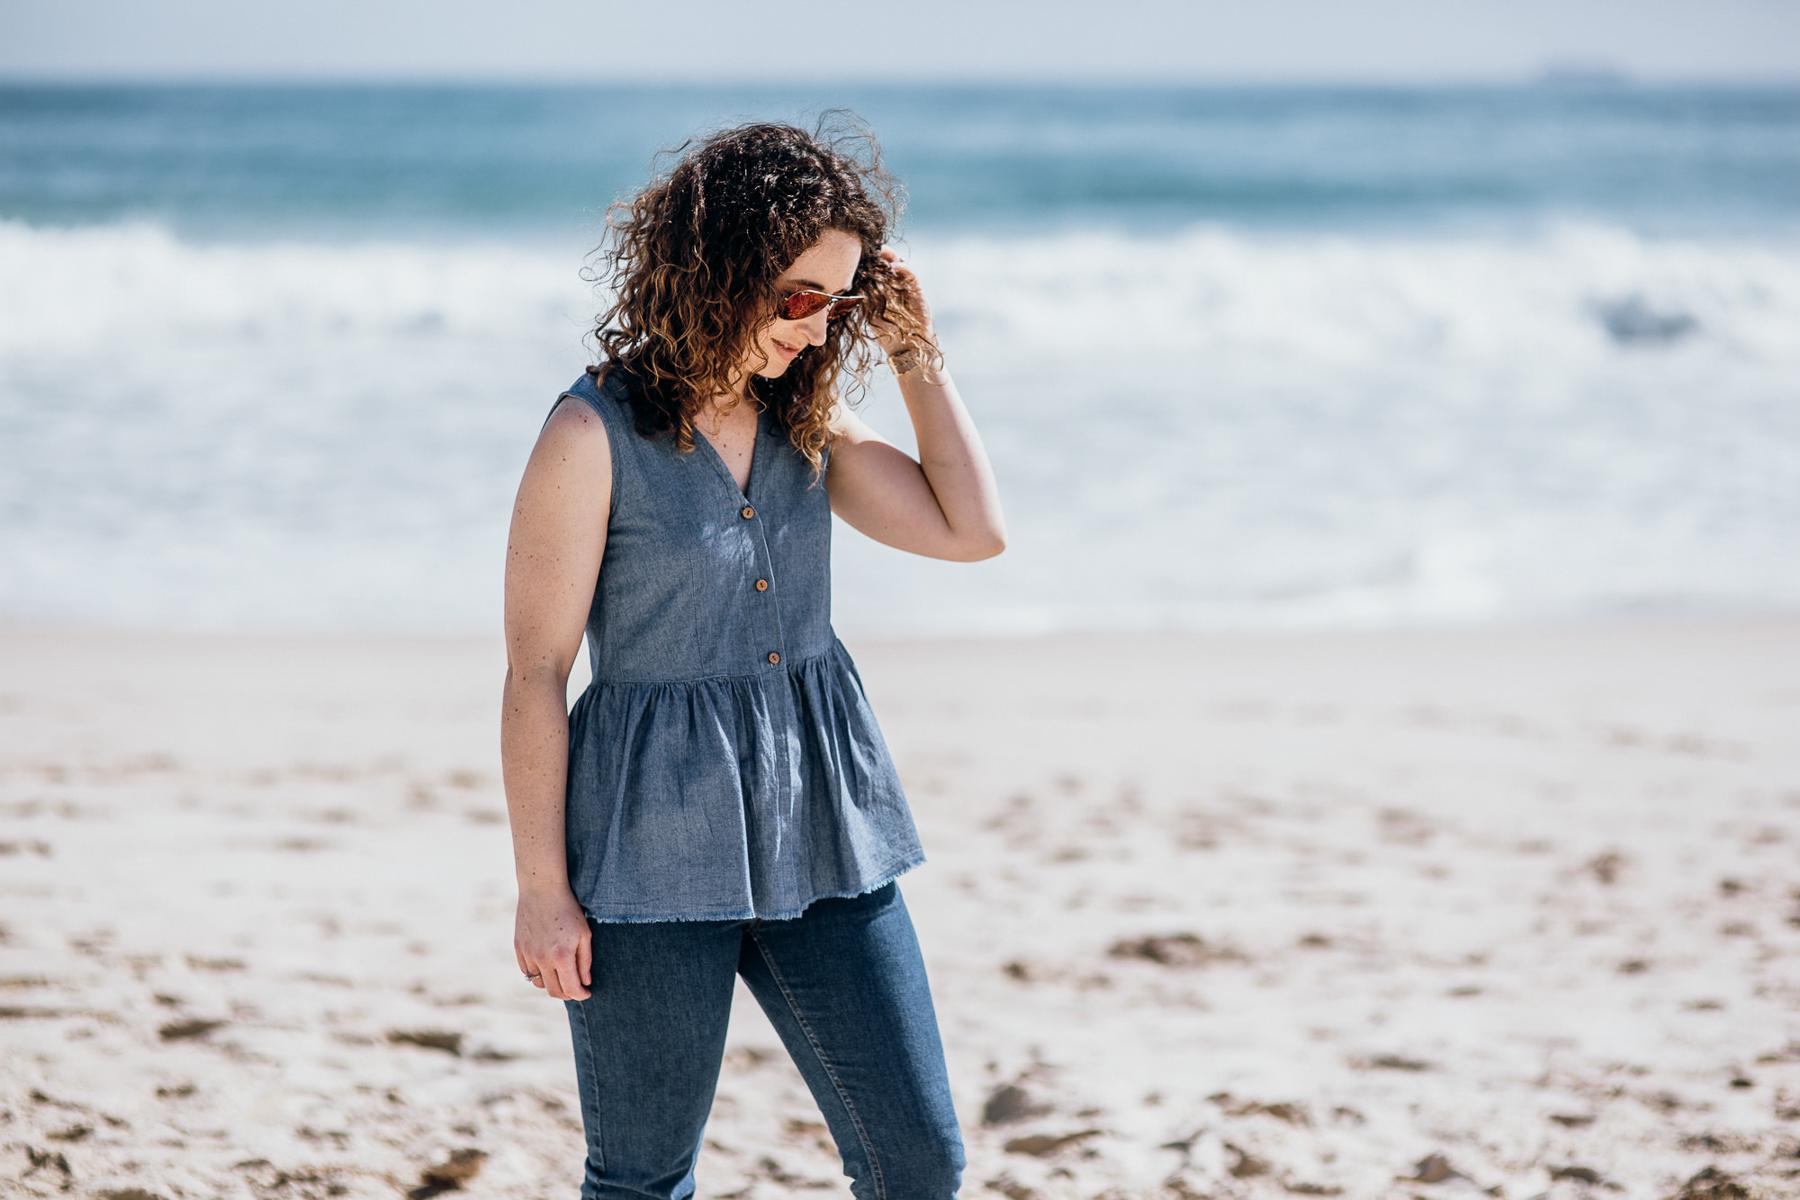 Darling Ranges sewing pattern sewn as a peplum top!! Megan Nielsen Design Diary